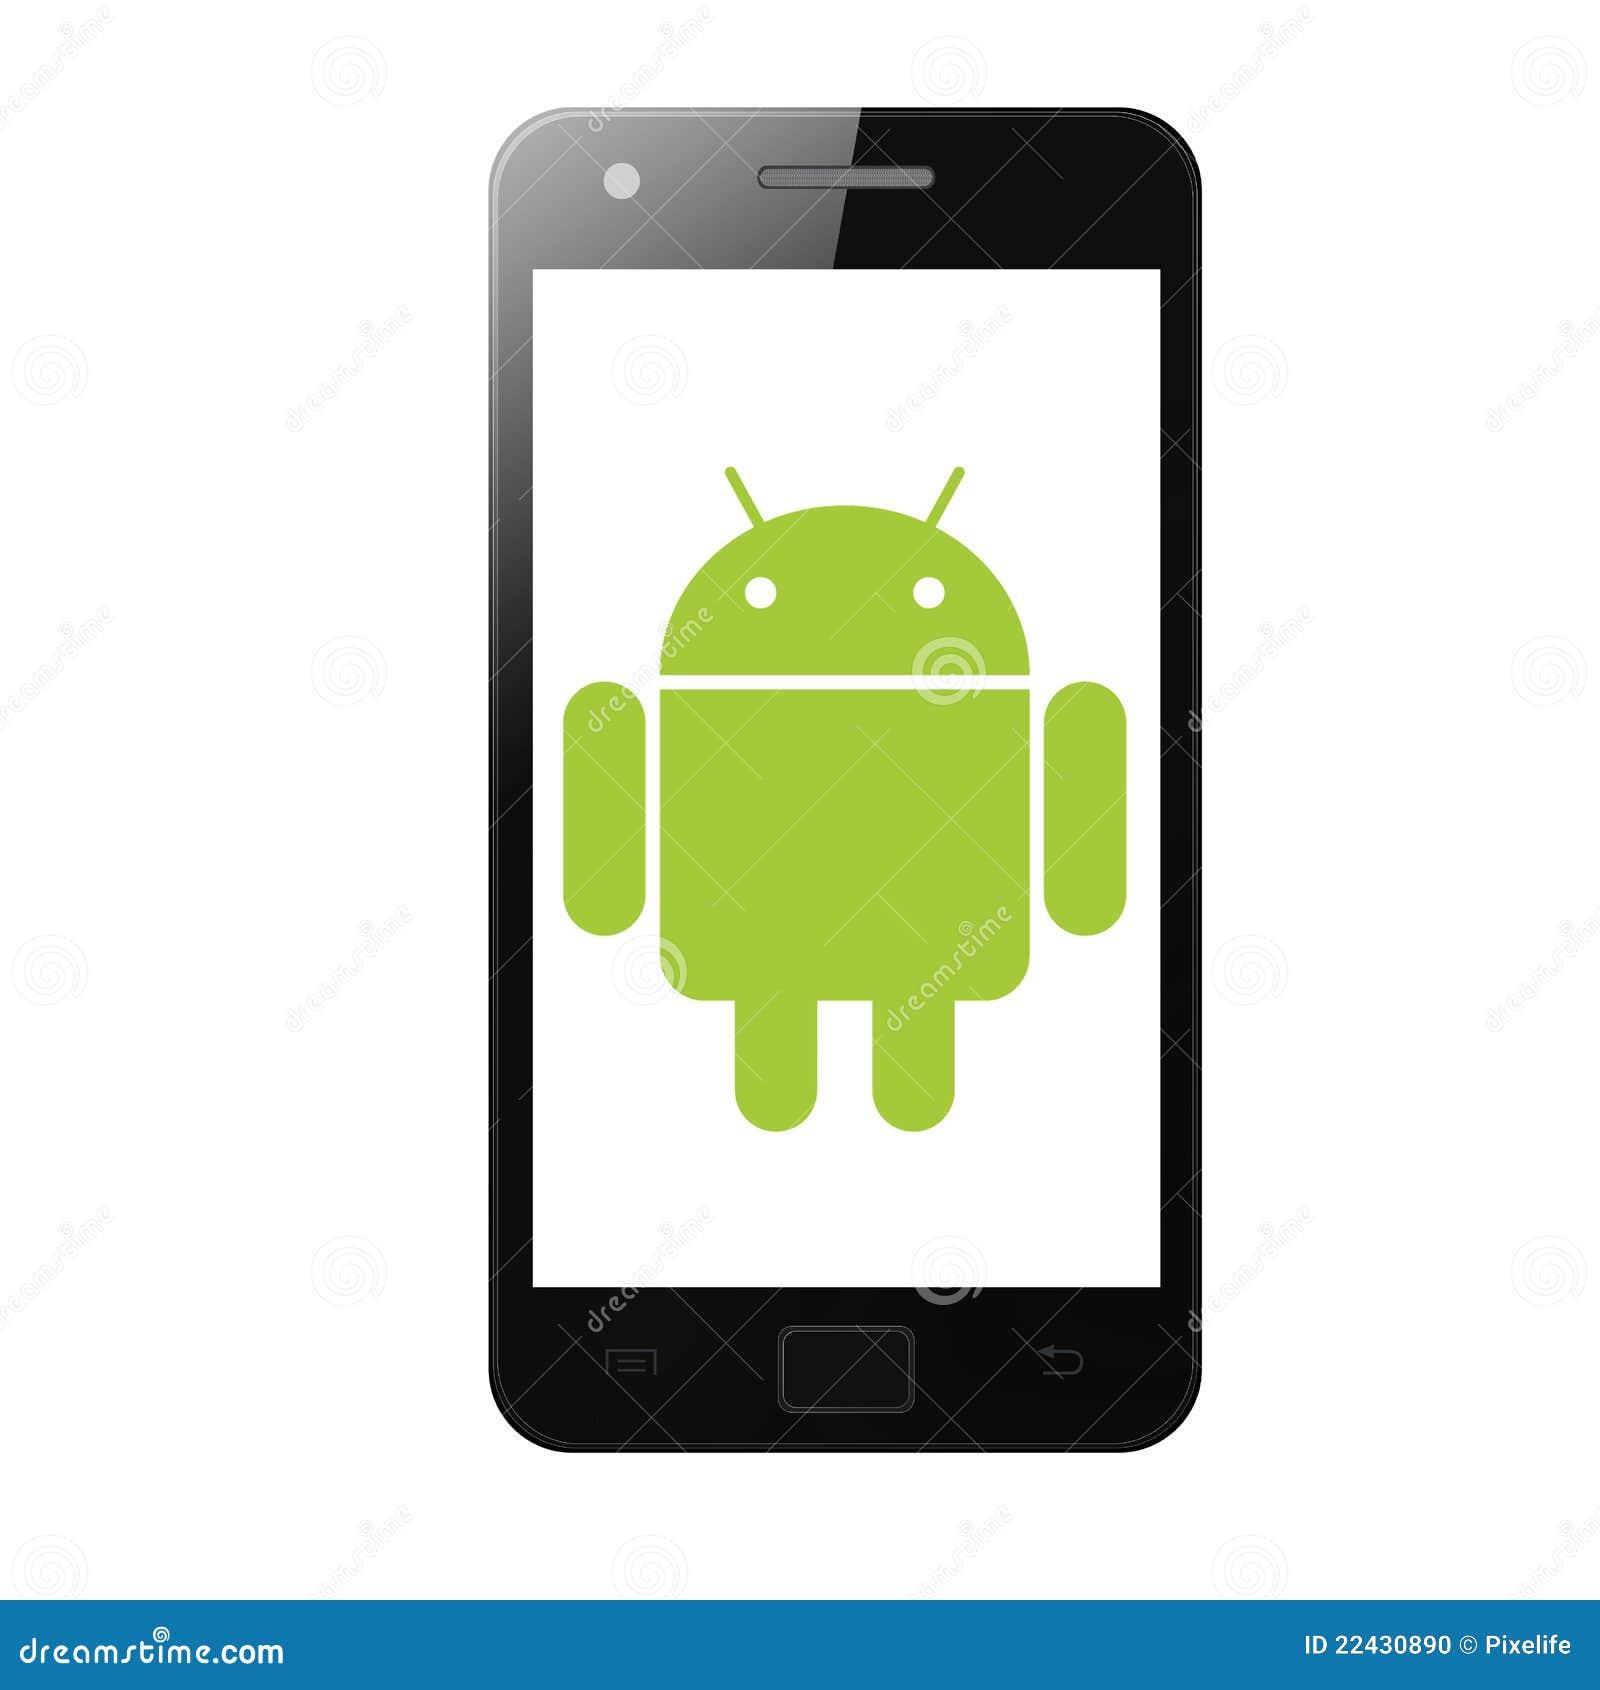 Androidtelefon